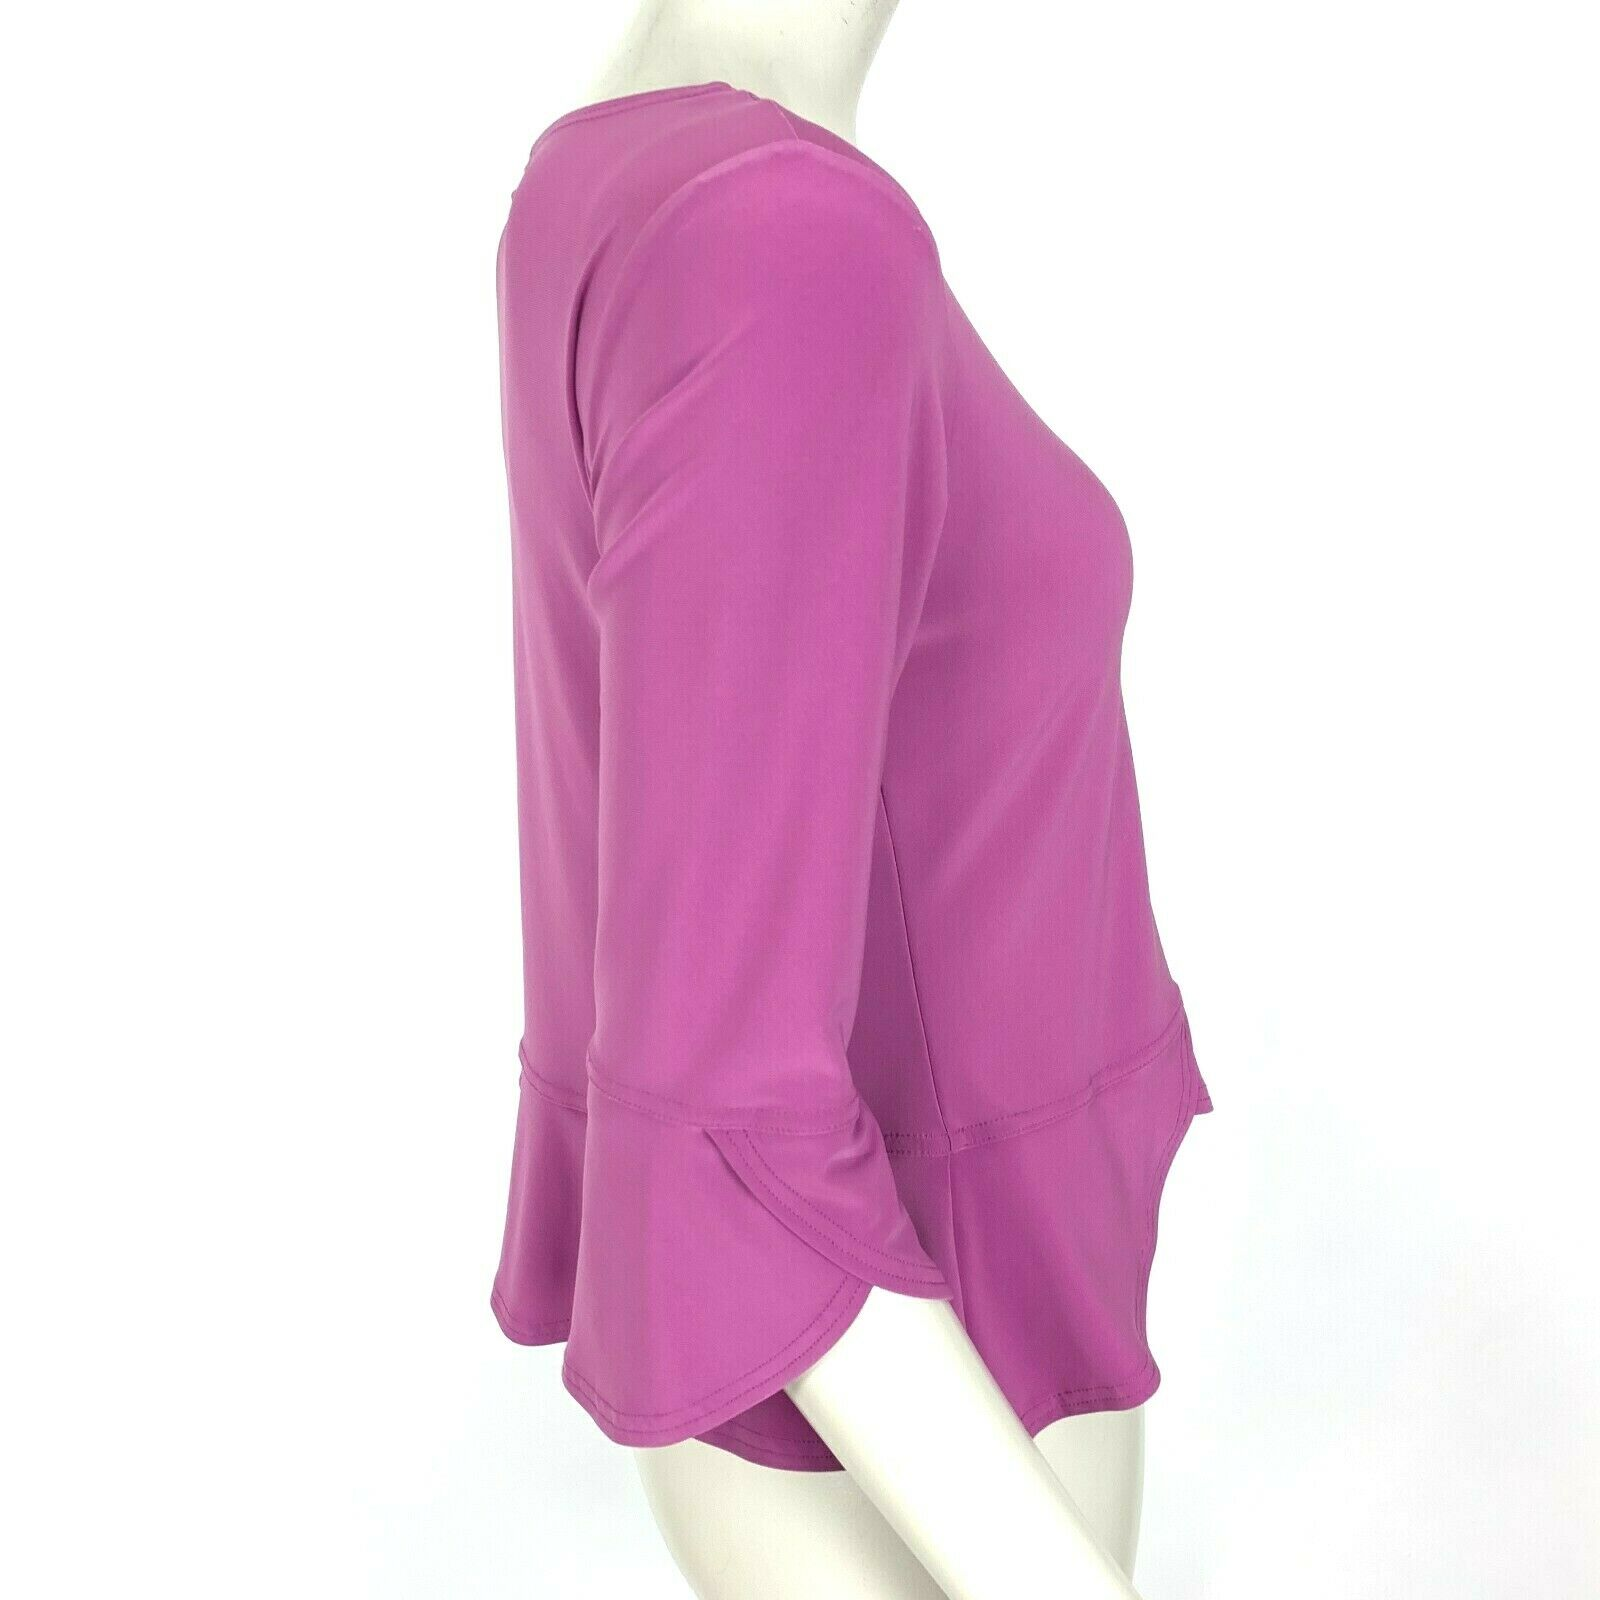 Sympli Canada Lilac Blouse Top 3/4 Sleeve Scoop N… - image 5